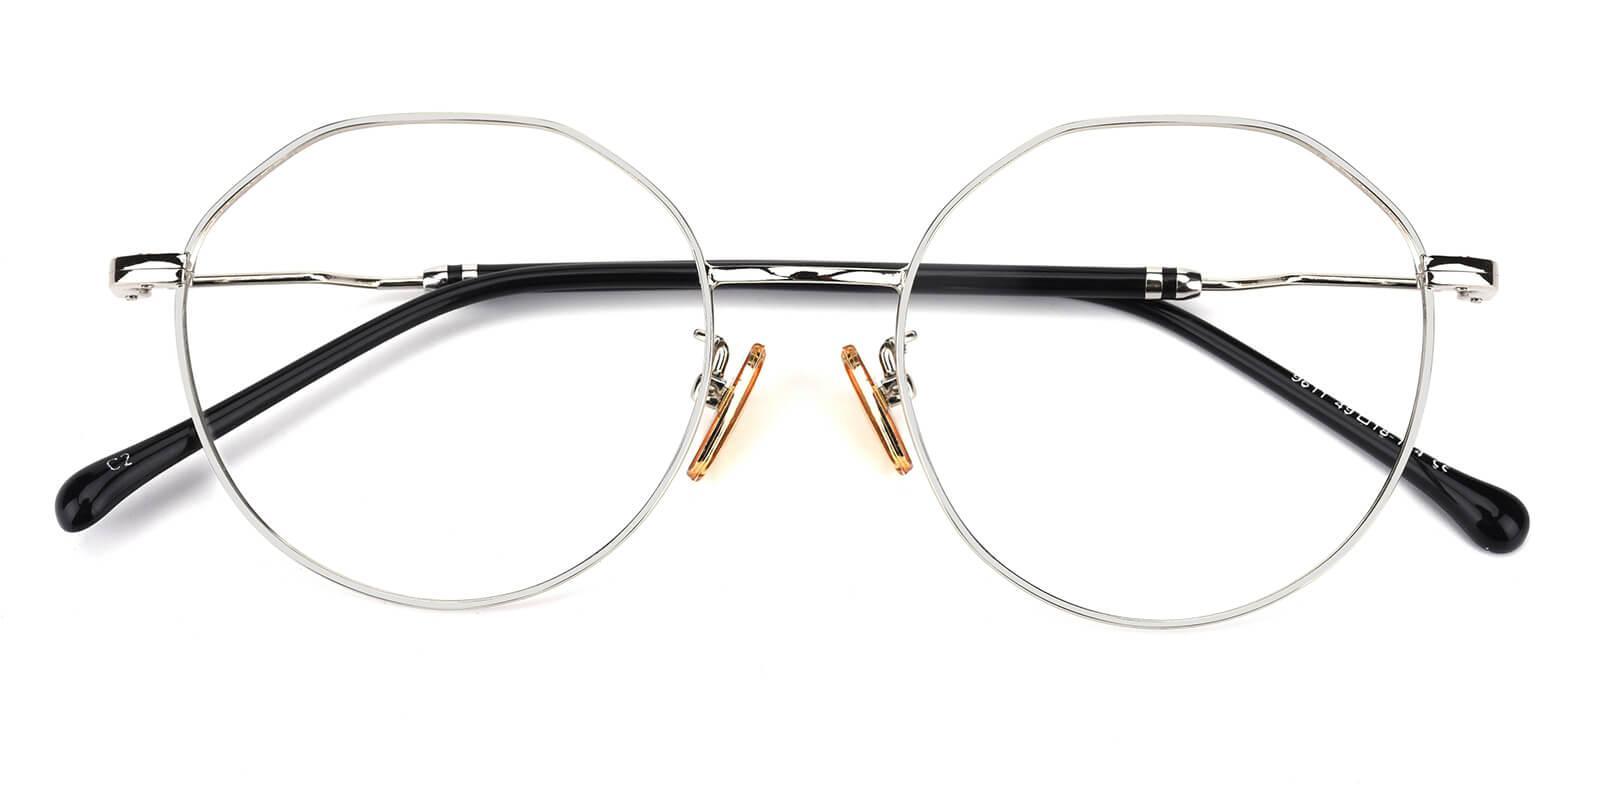 Clarker-Silver-Geometric-Metal-Eyeglasses-detail